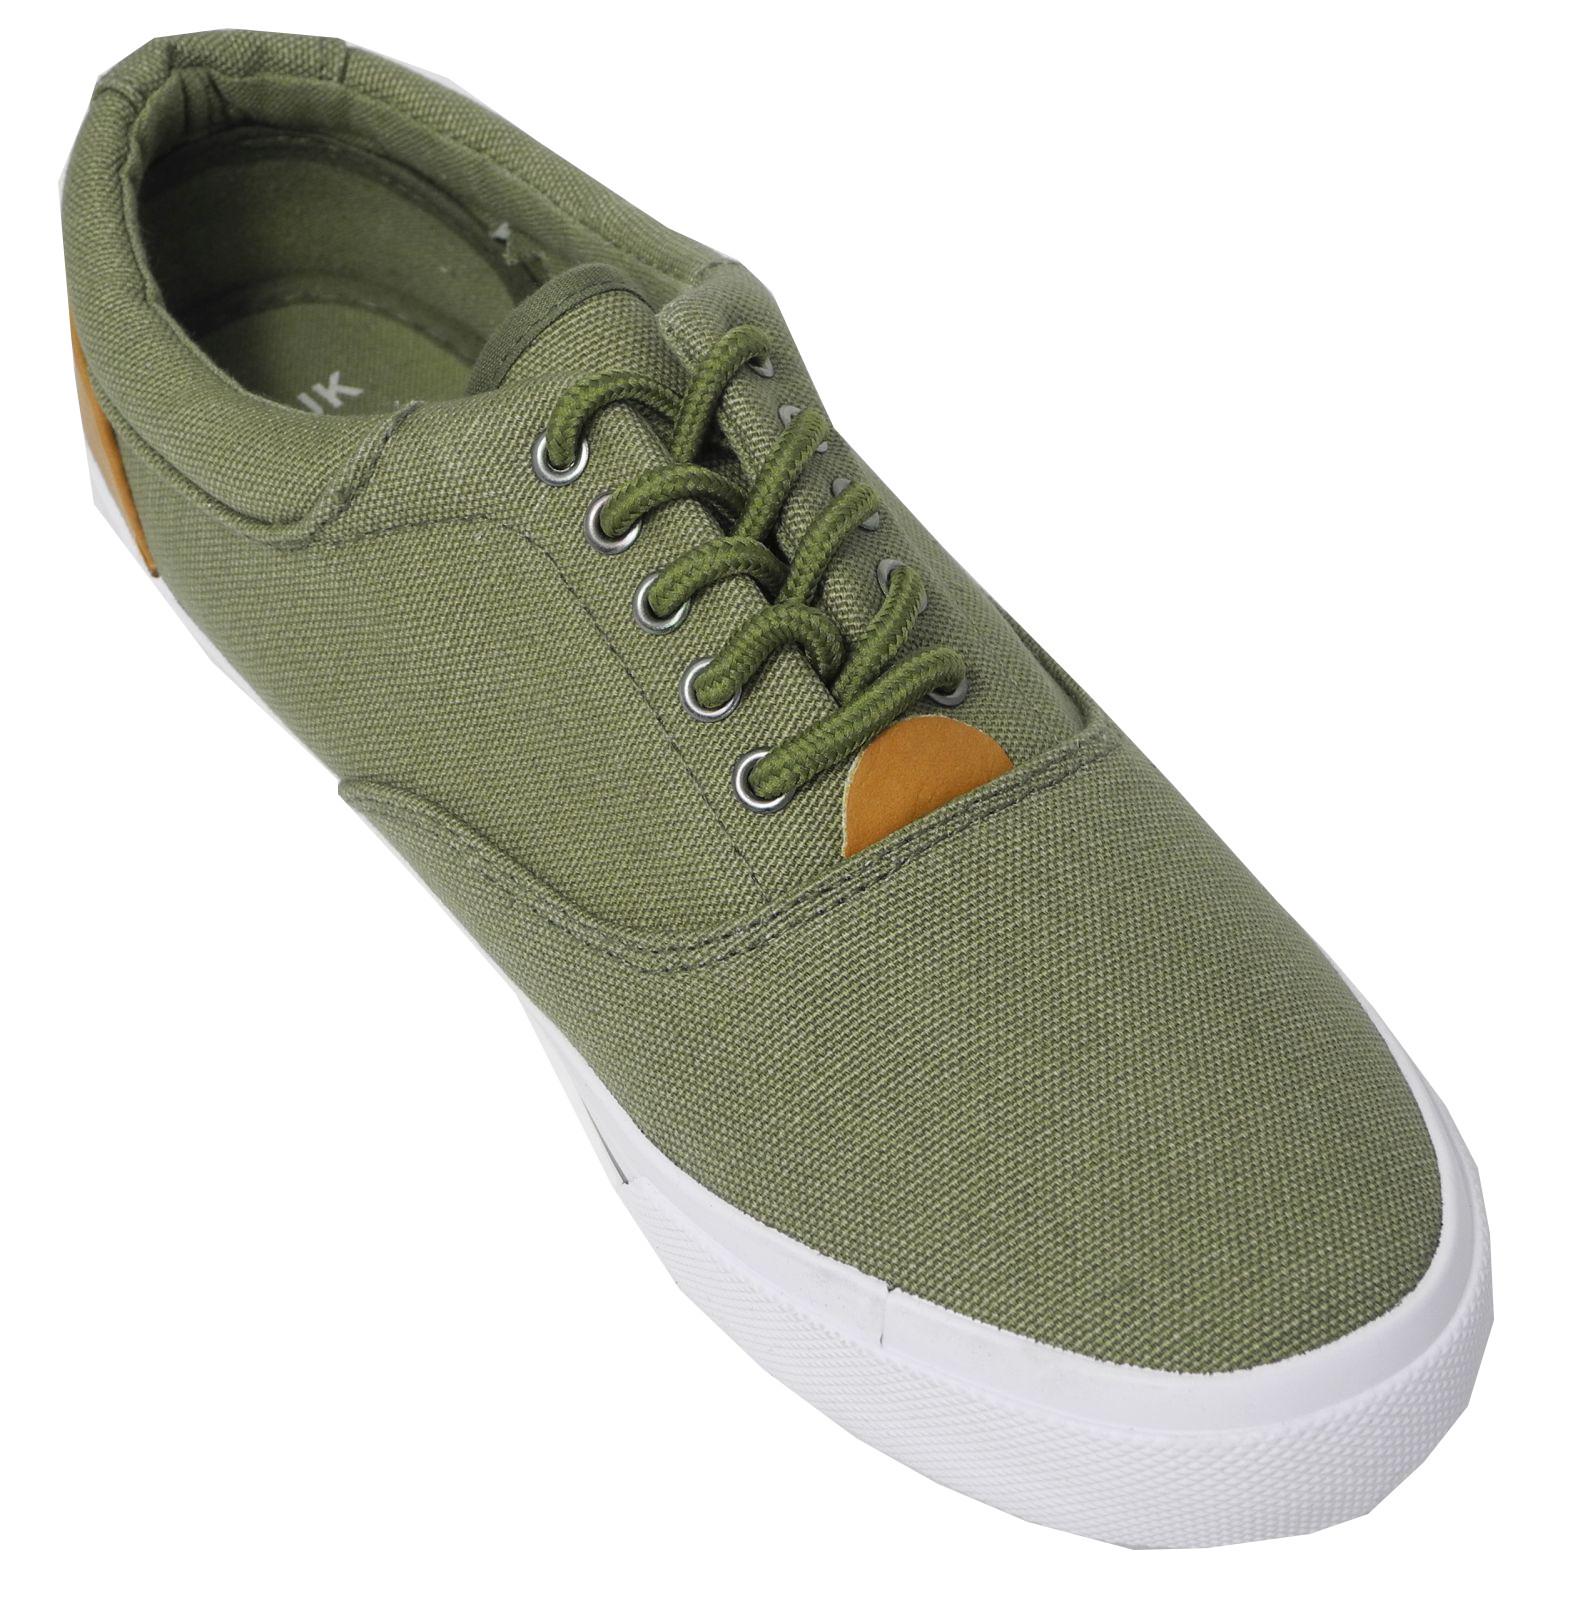 mens khaki canvas shoes lace up trainers casual shoes